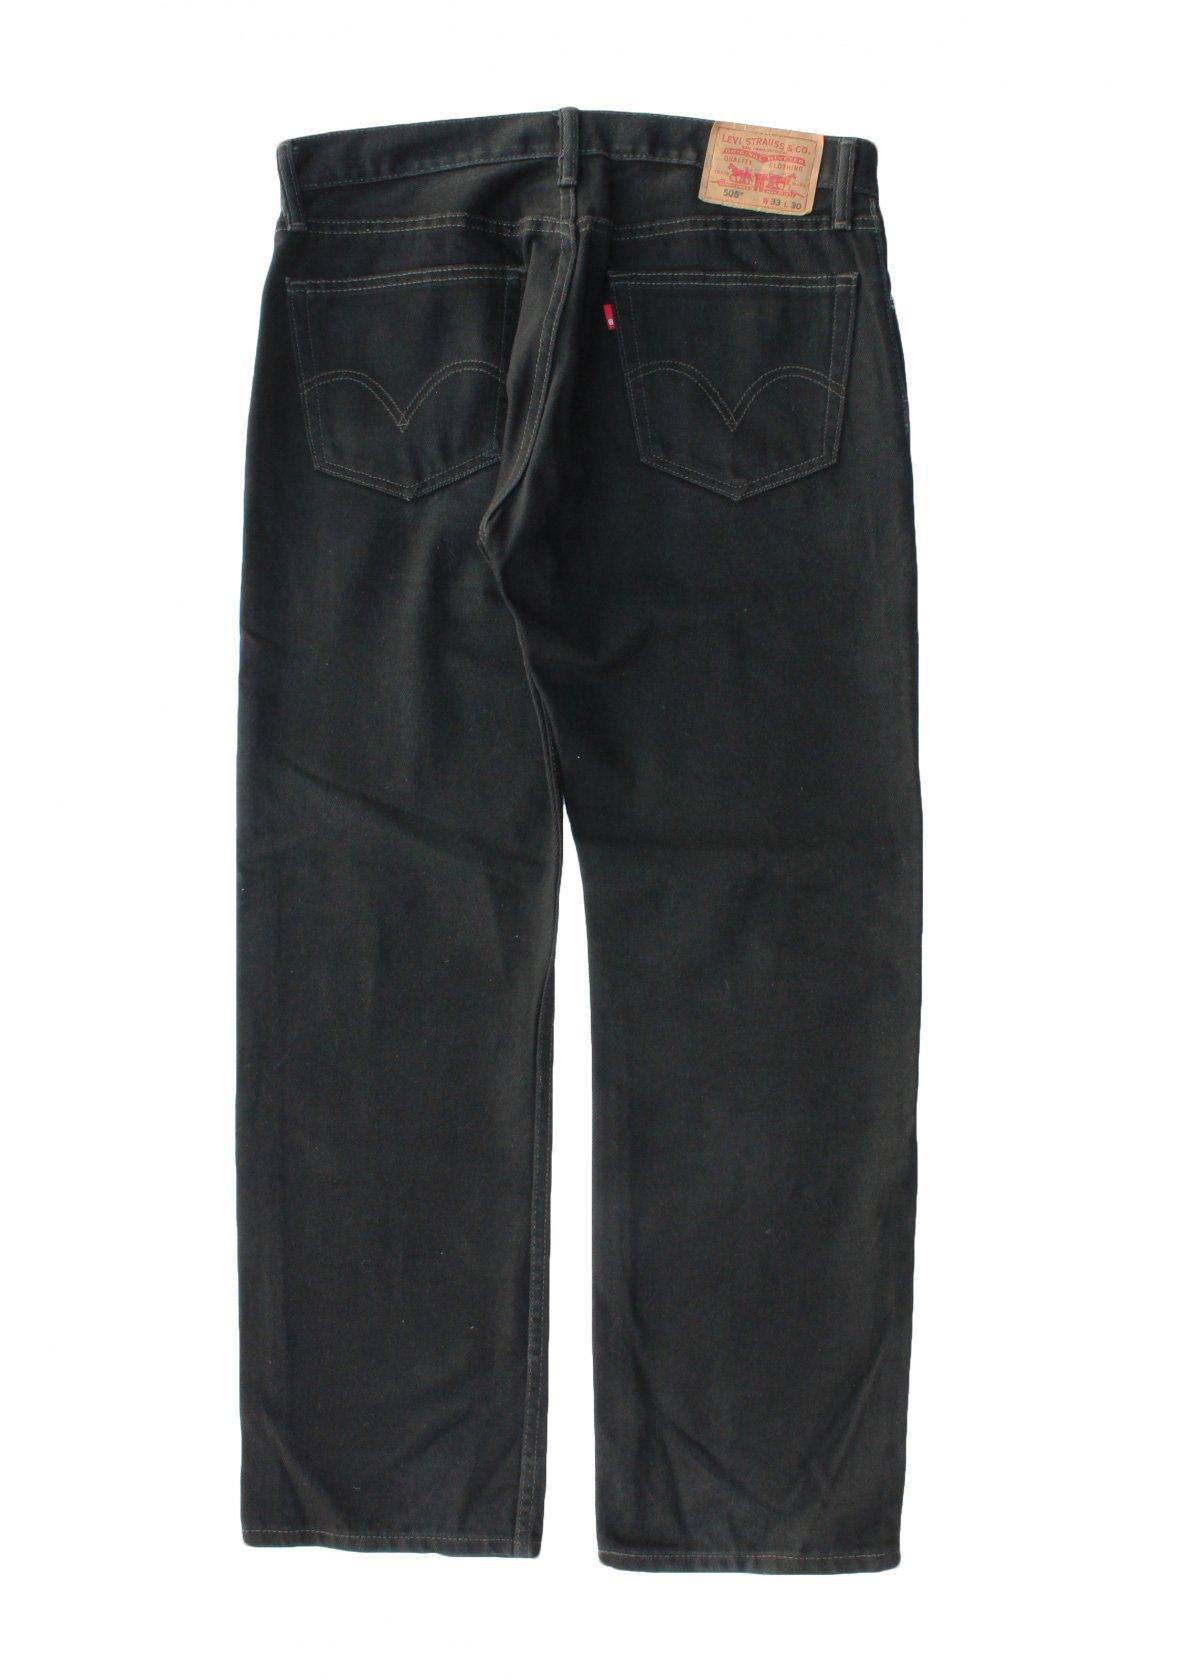 I&I 古着 通販 Levi's 505  Denim Pants 詳細画像5